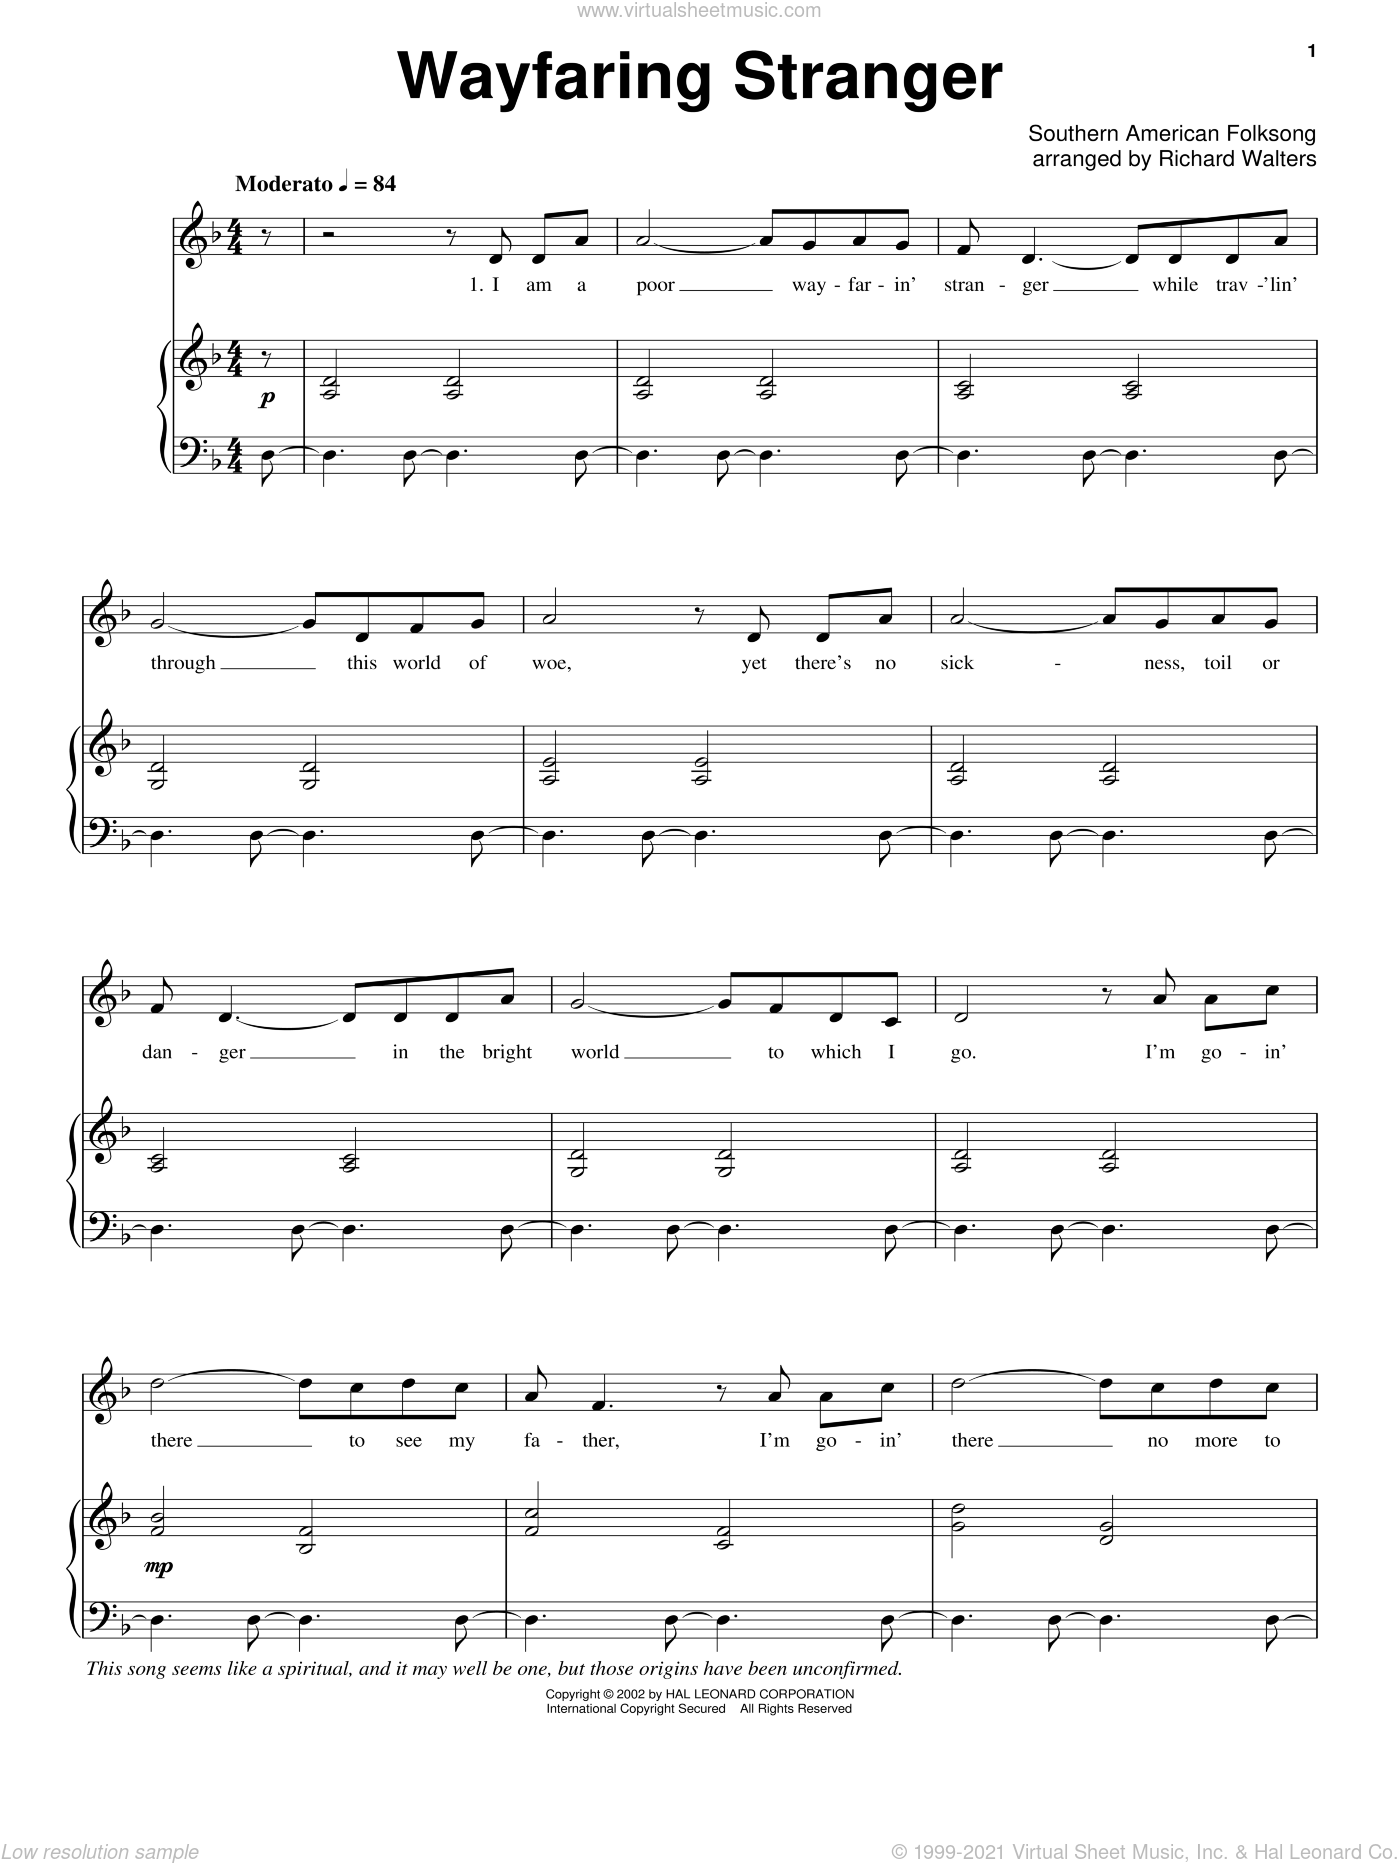 Wayfaring Stranger sheet music for voice, piano or guitar, intermediate skill level